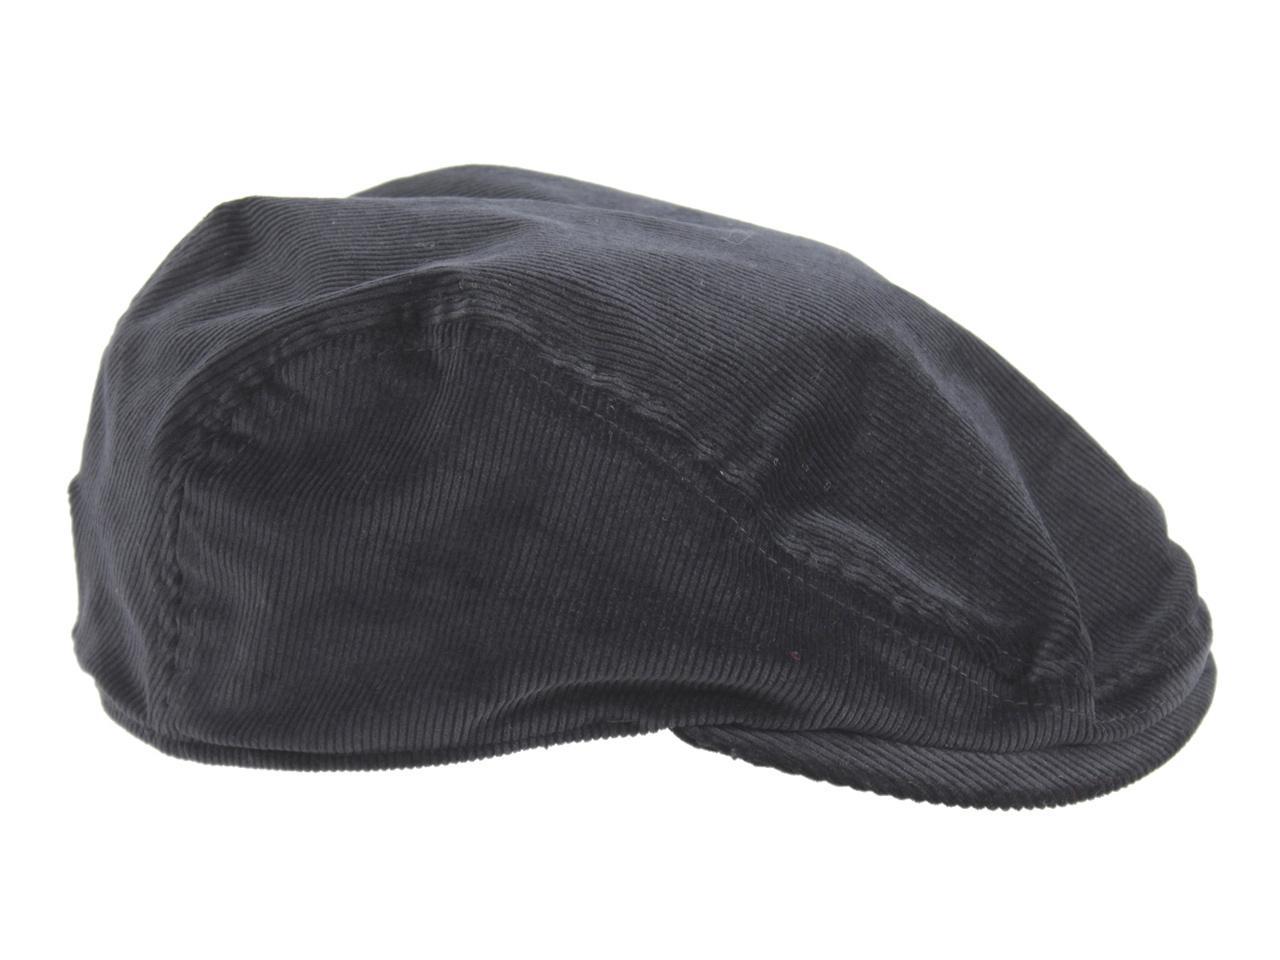 efc36cd6526d04 Kangol Men's Cord Ivy Flat Cap Hat